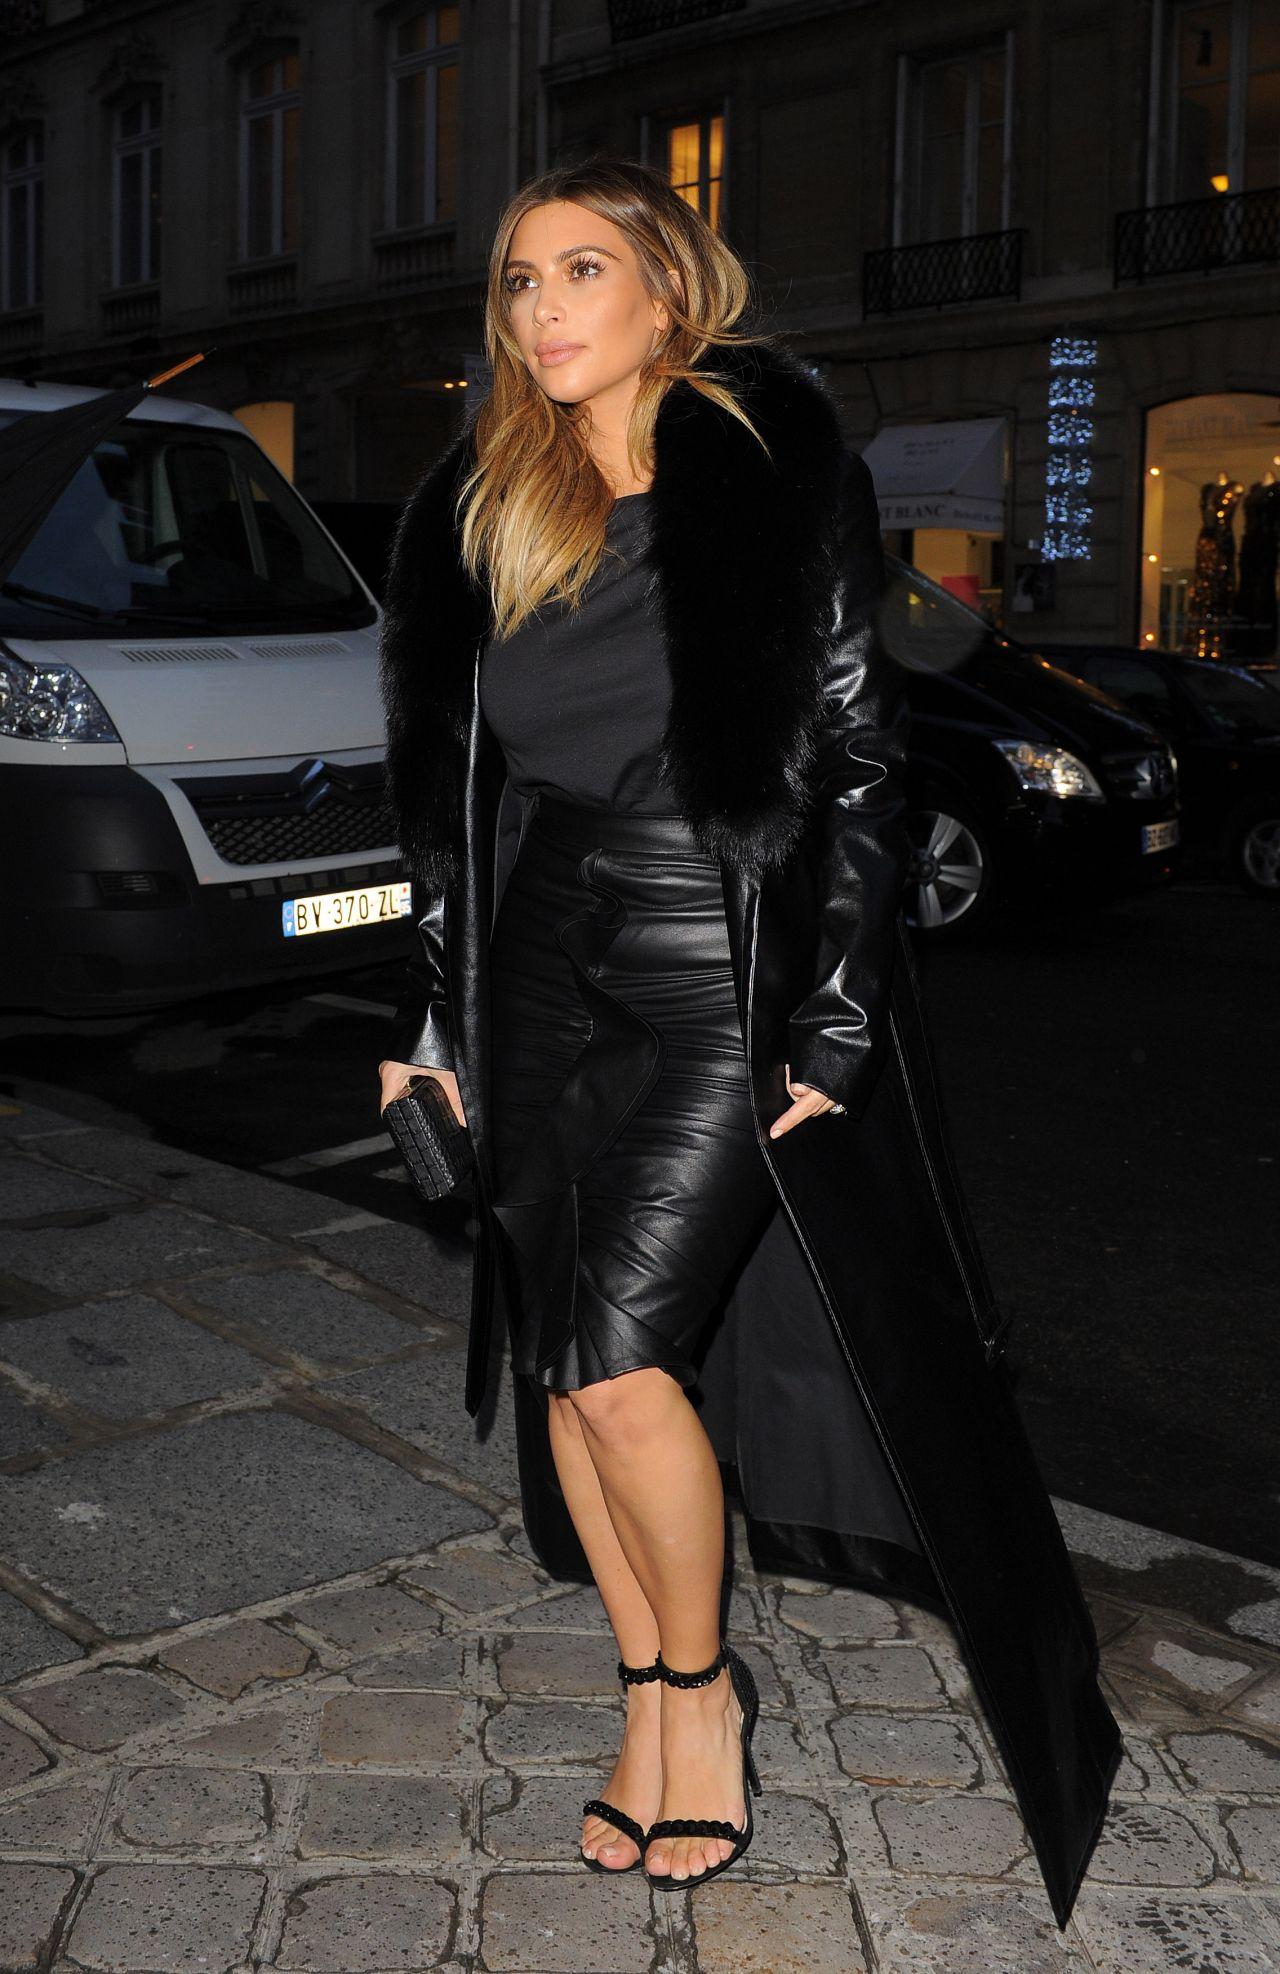 Kim Kardashian O Amp A In Paris Shopping January 2014